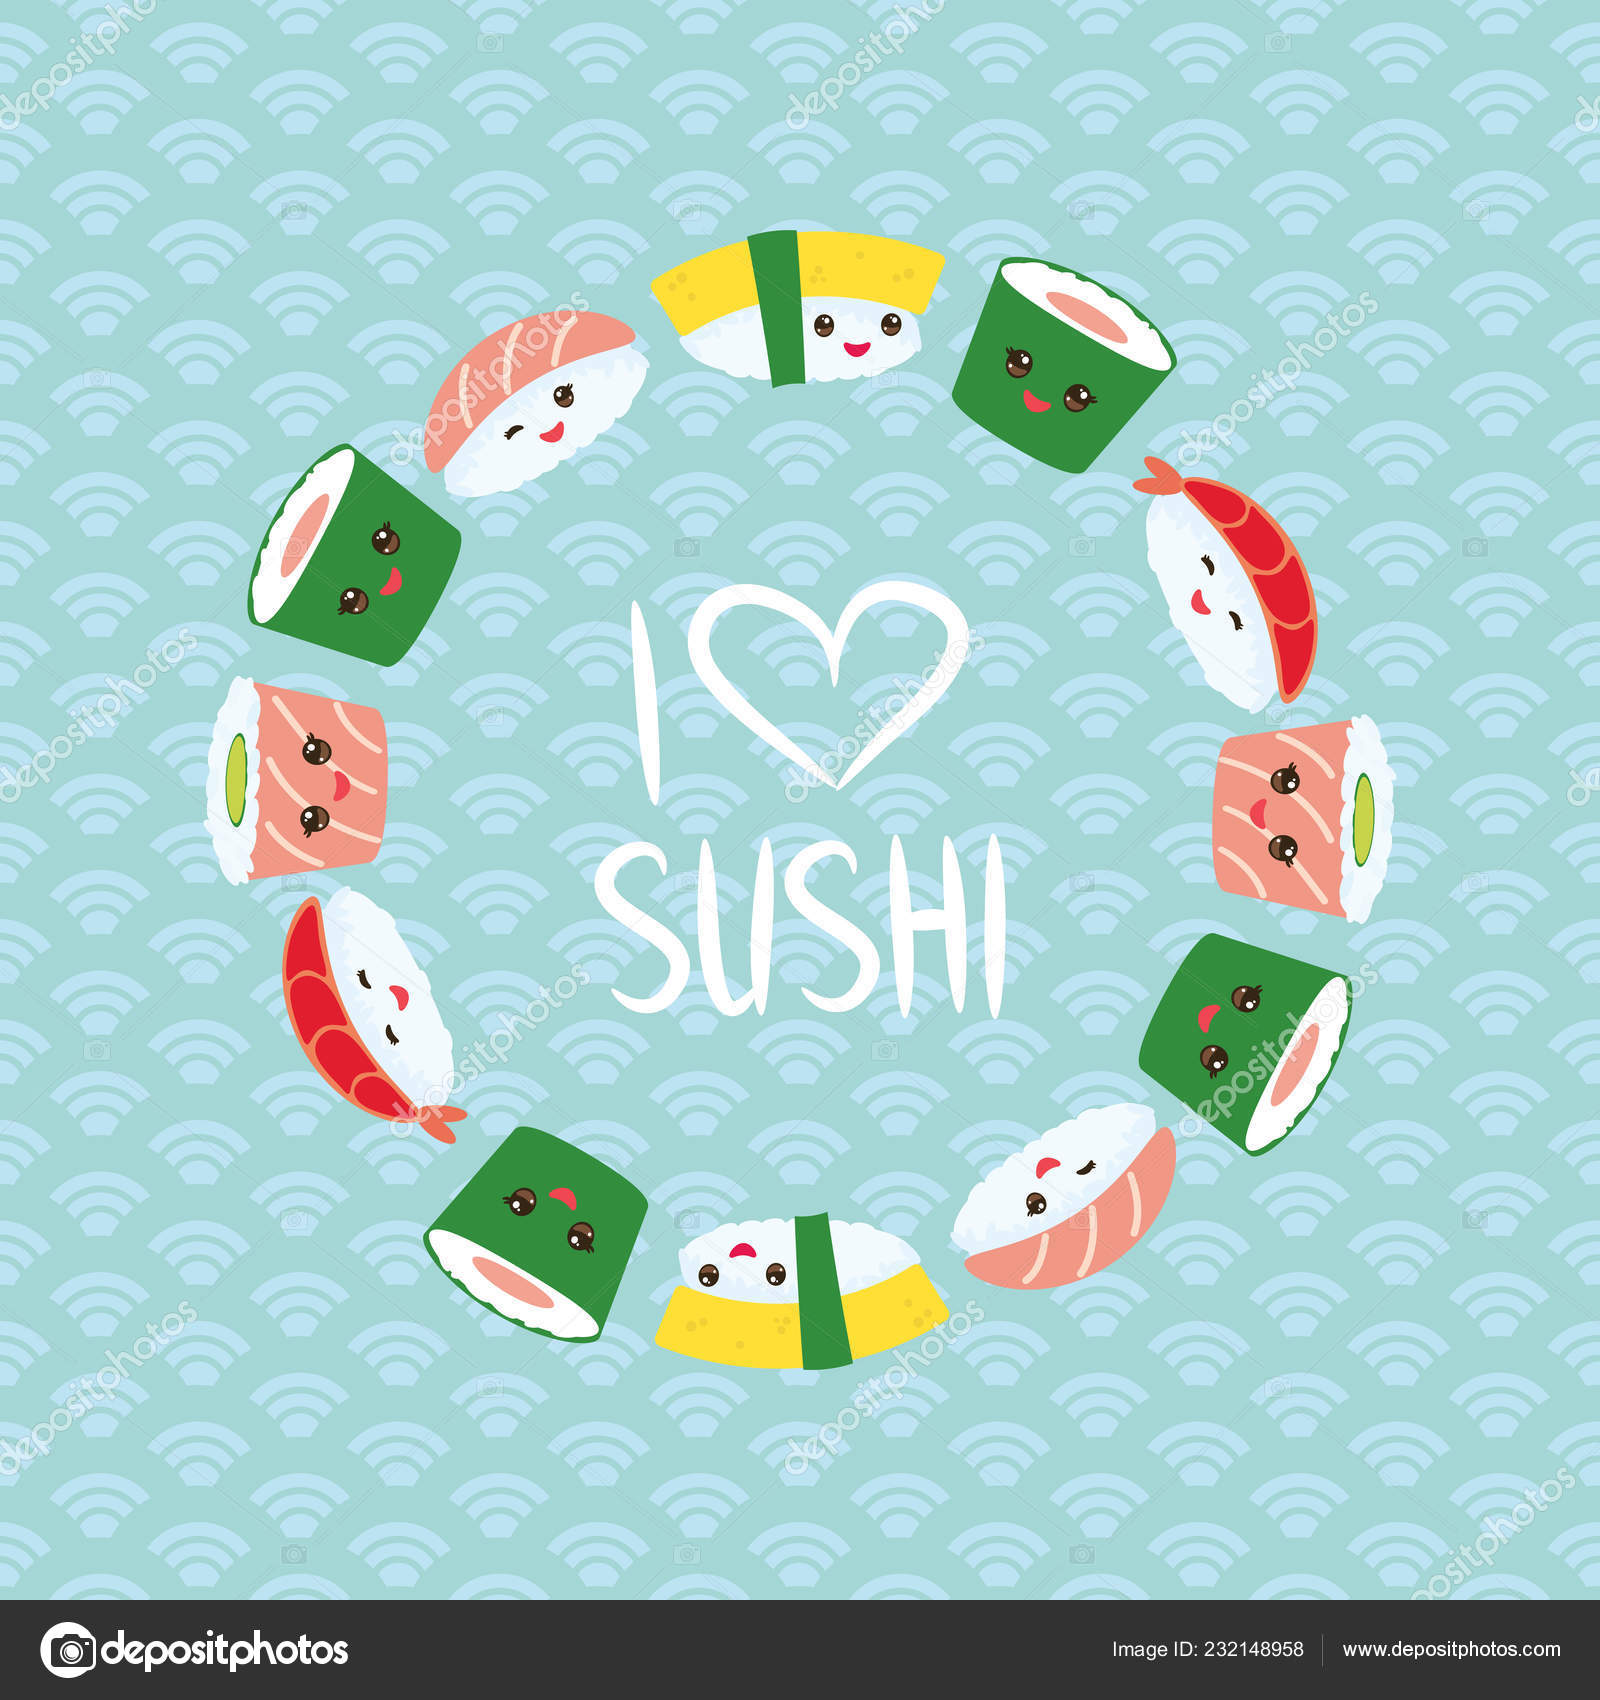 01ff20ef8 I love sushi. Kawaii funny sushi set with pink cheeks and big eyes, emoji.  Blue background with japanese circle pattern, round wreath.